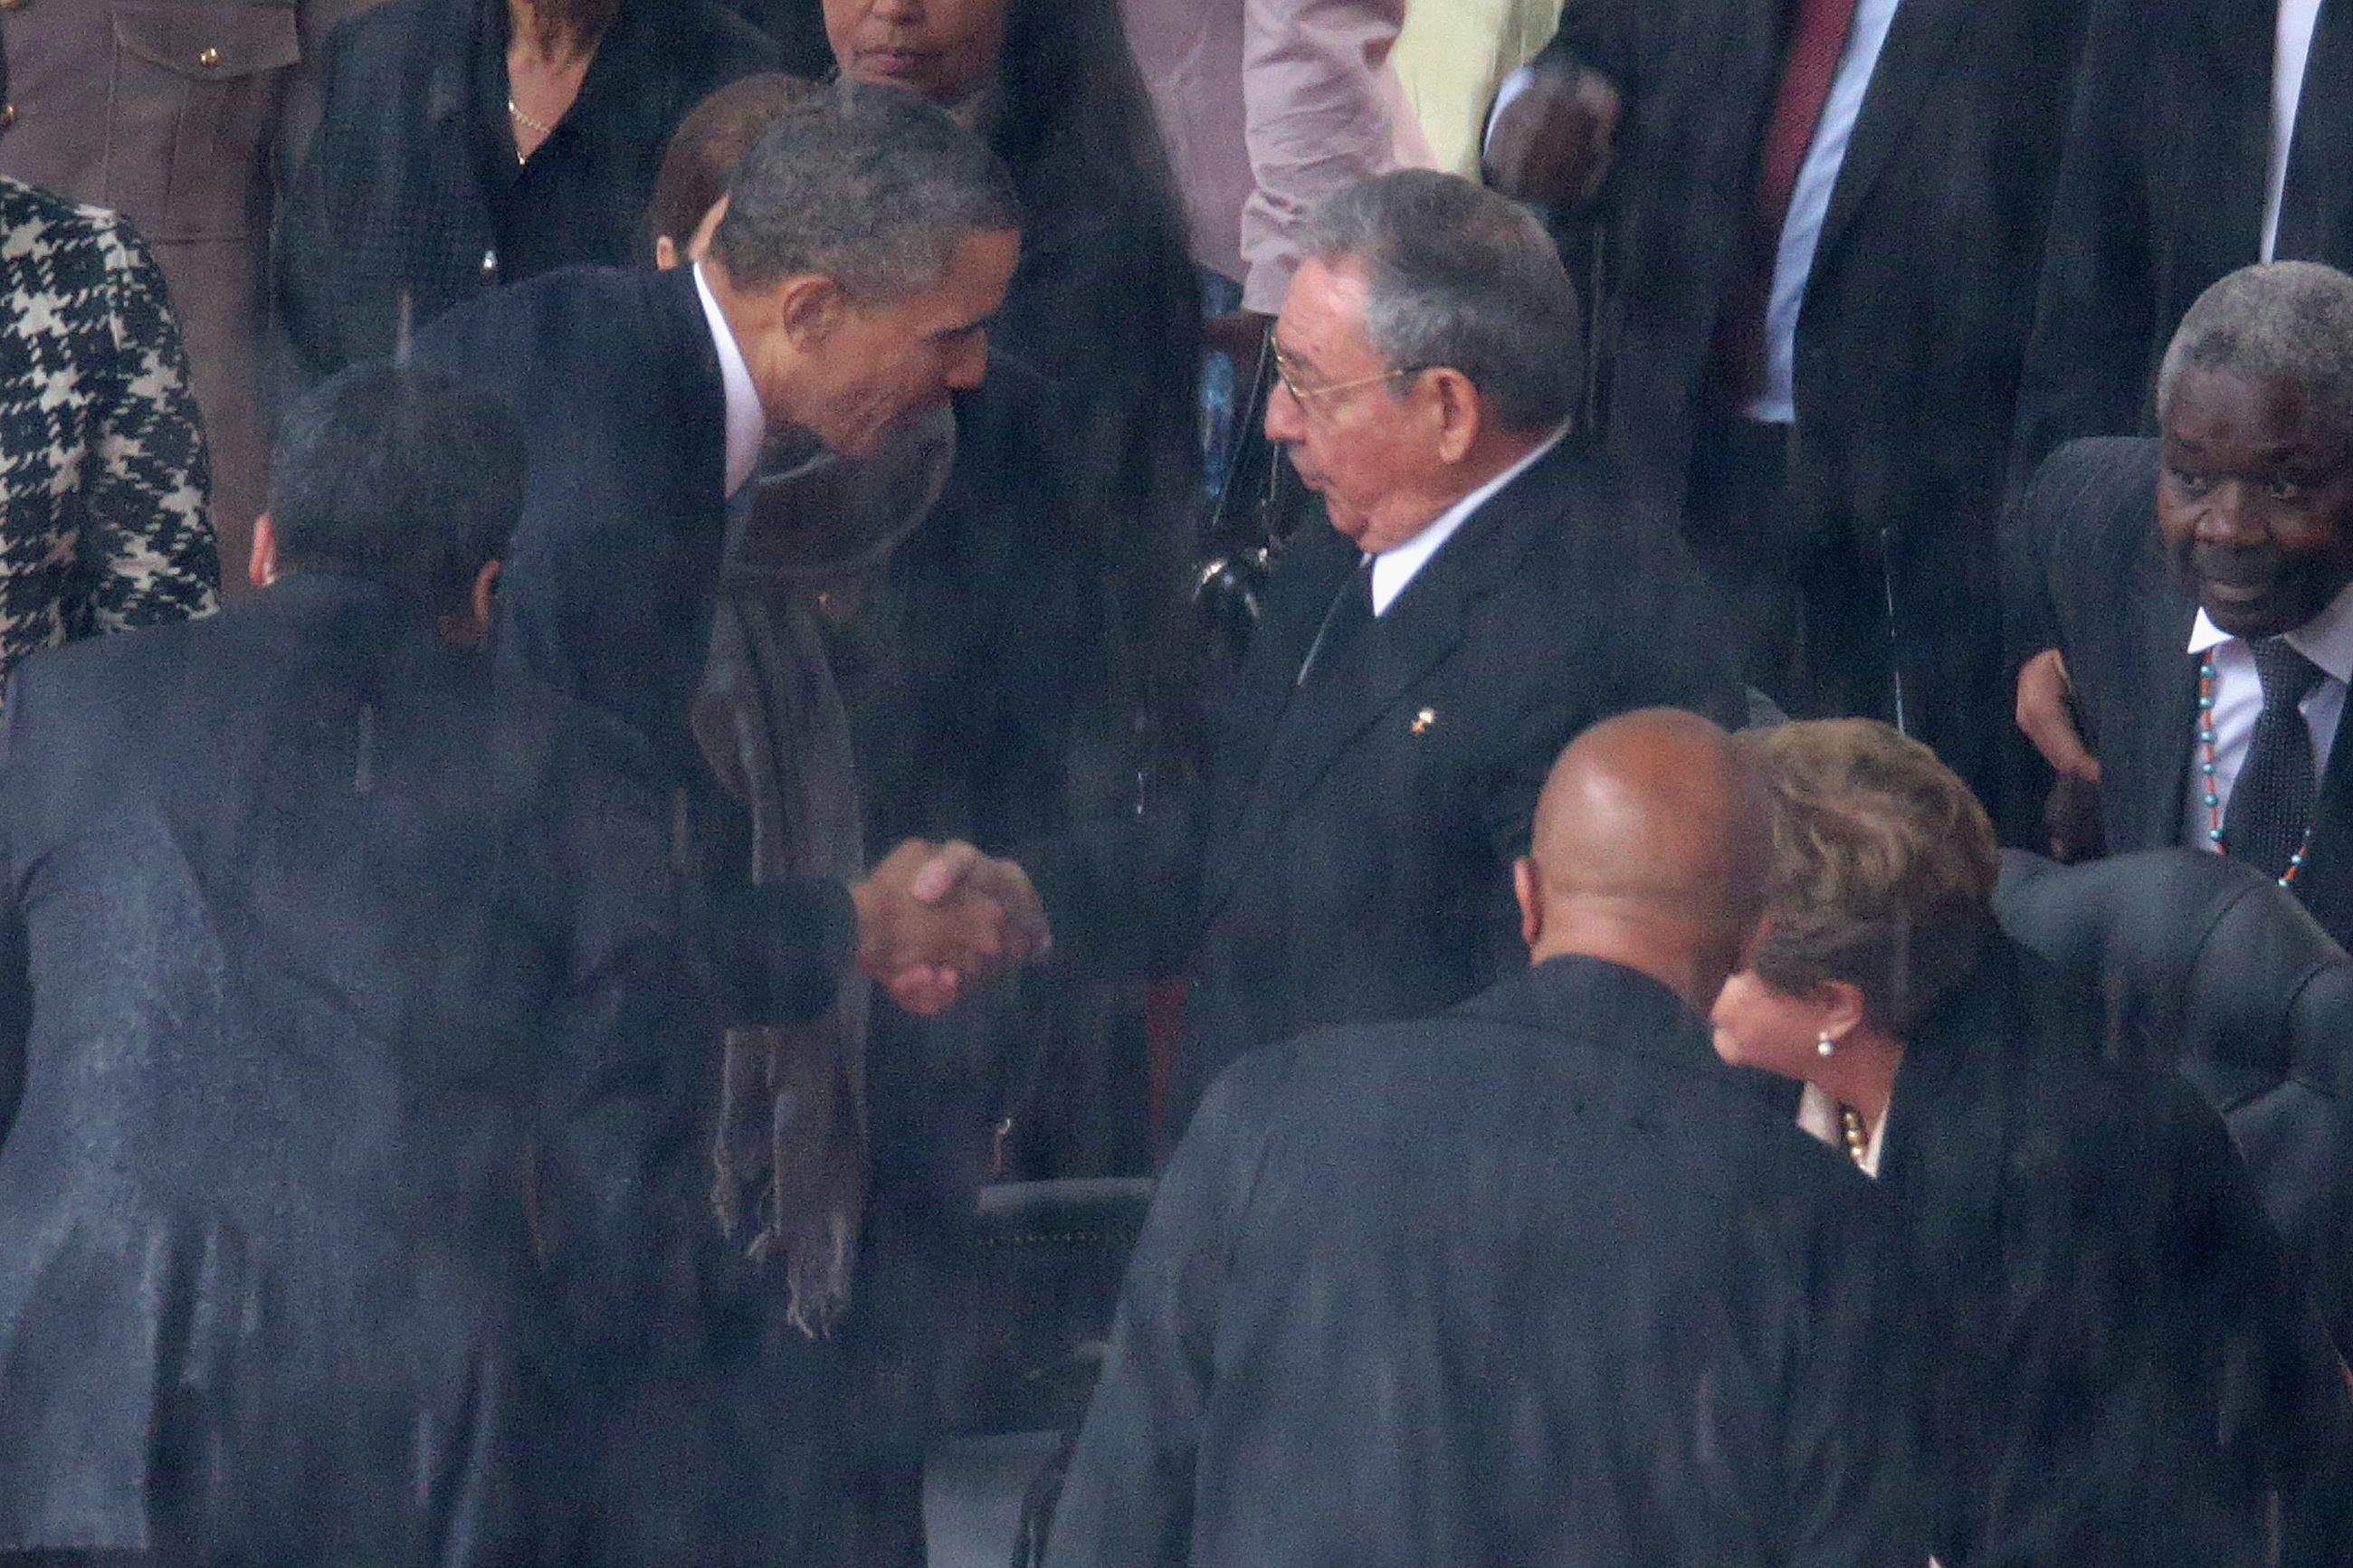 Obama Meets Raul Castro at Mandela Memorial